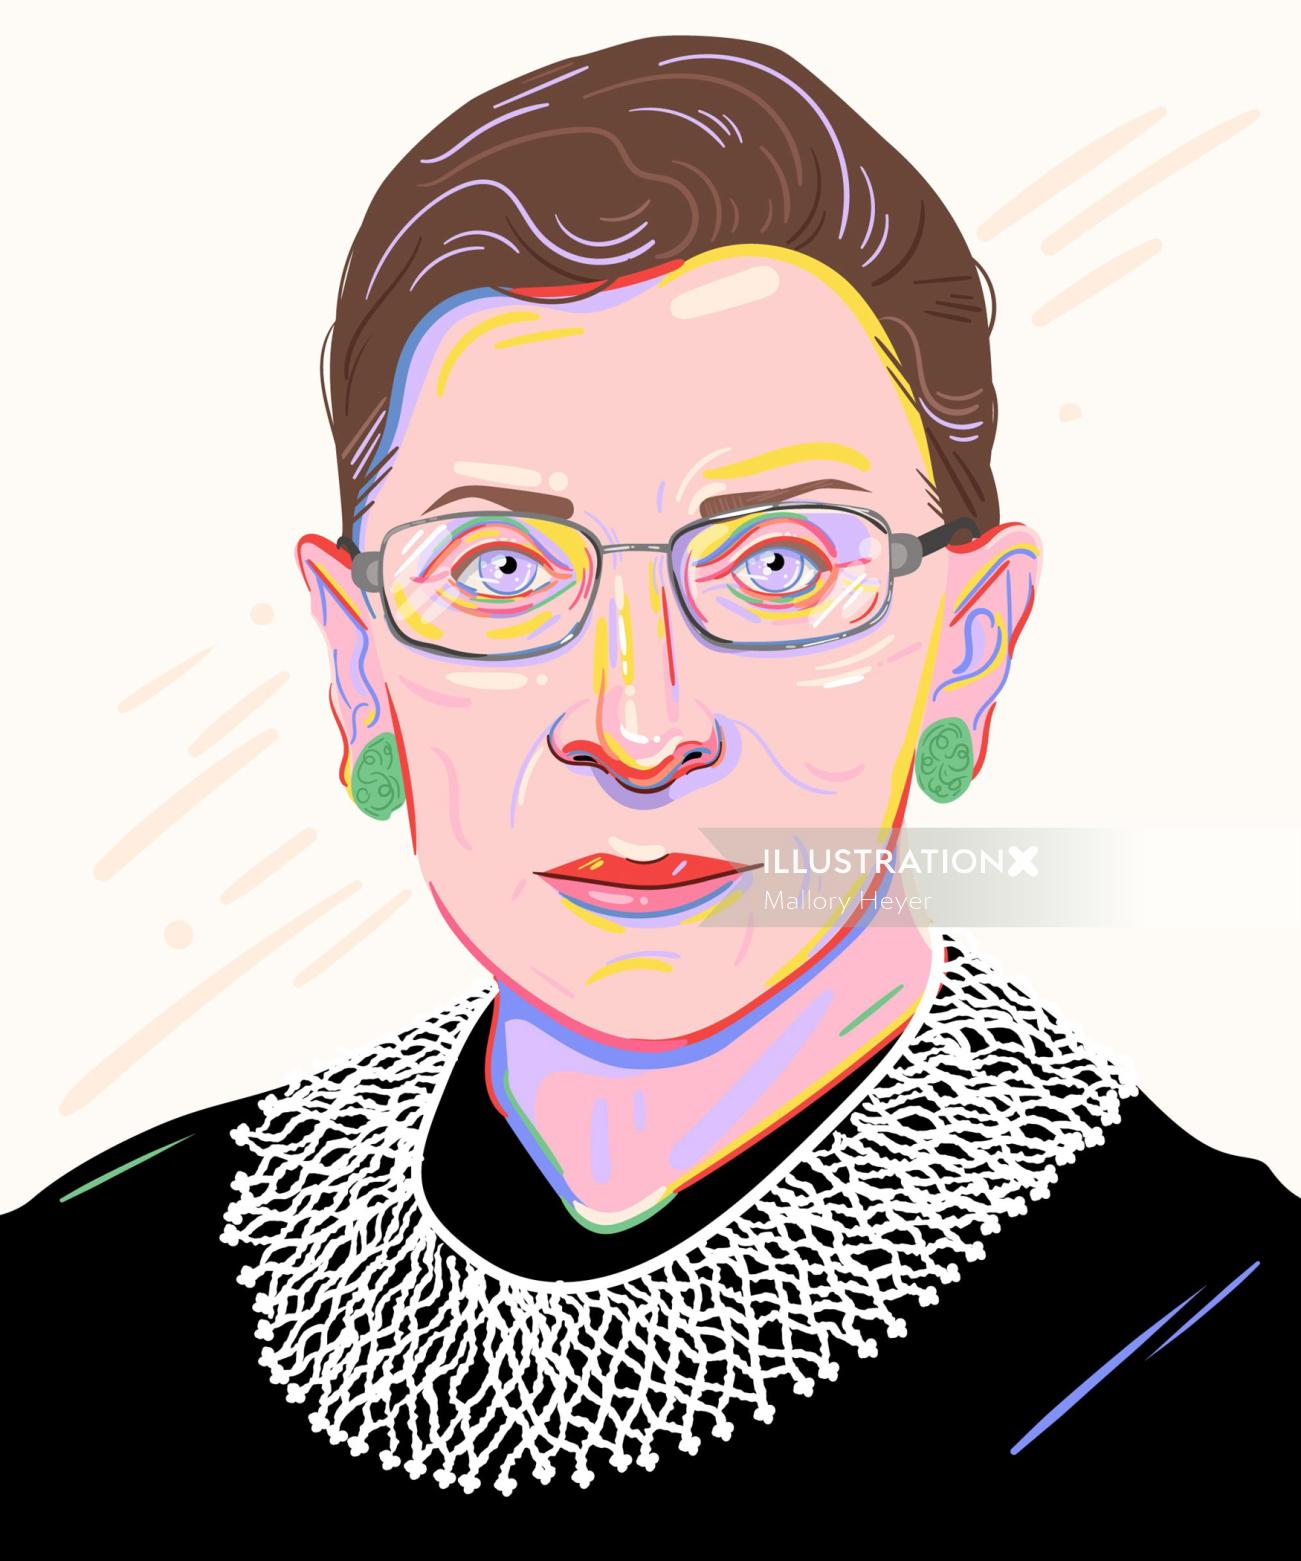 Portrait illustration of Ruth Bader Ginsburg